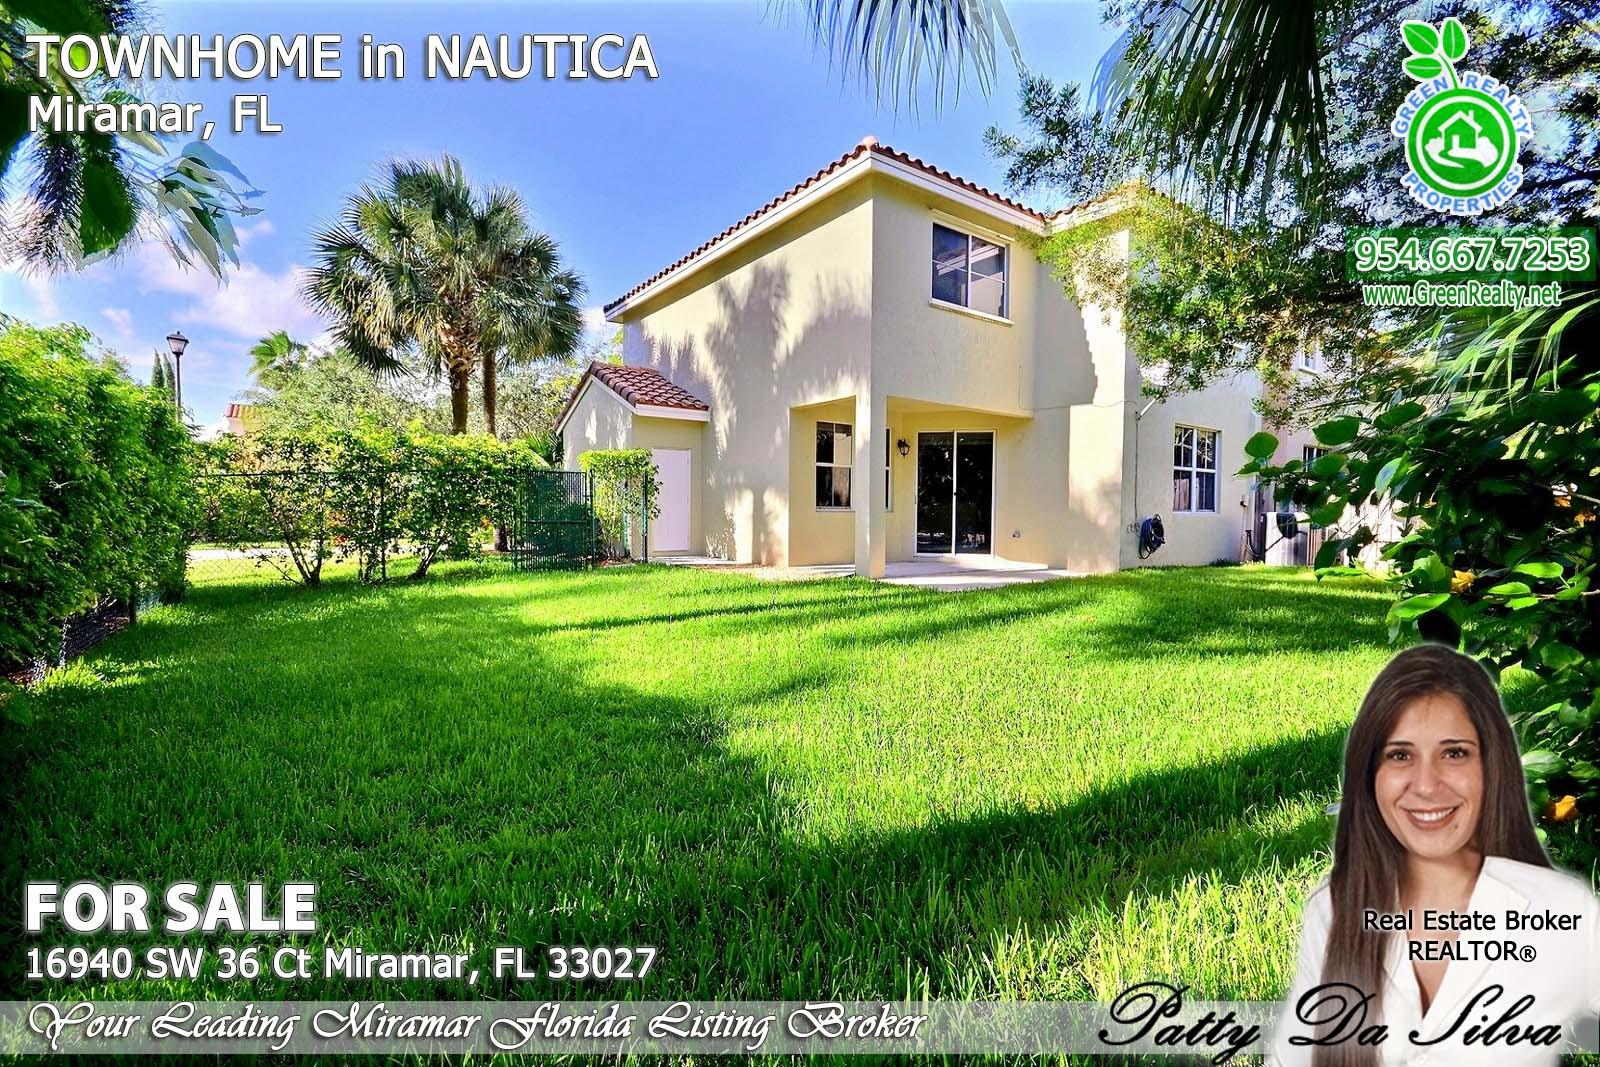 16940 SW 36 Ct Miramar, FL 33027 - Nautica Miramar Homes For Sale (6)